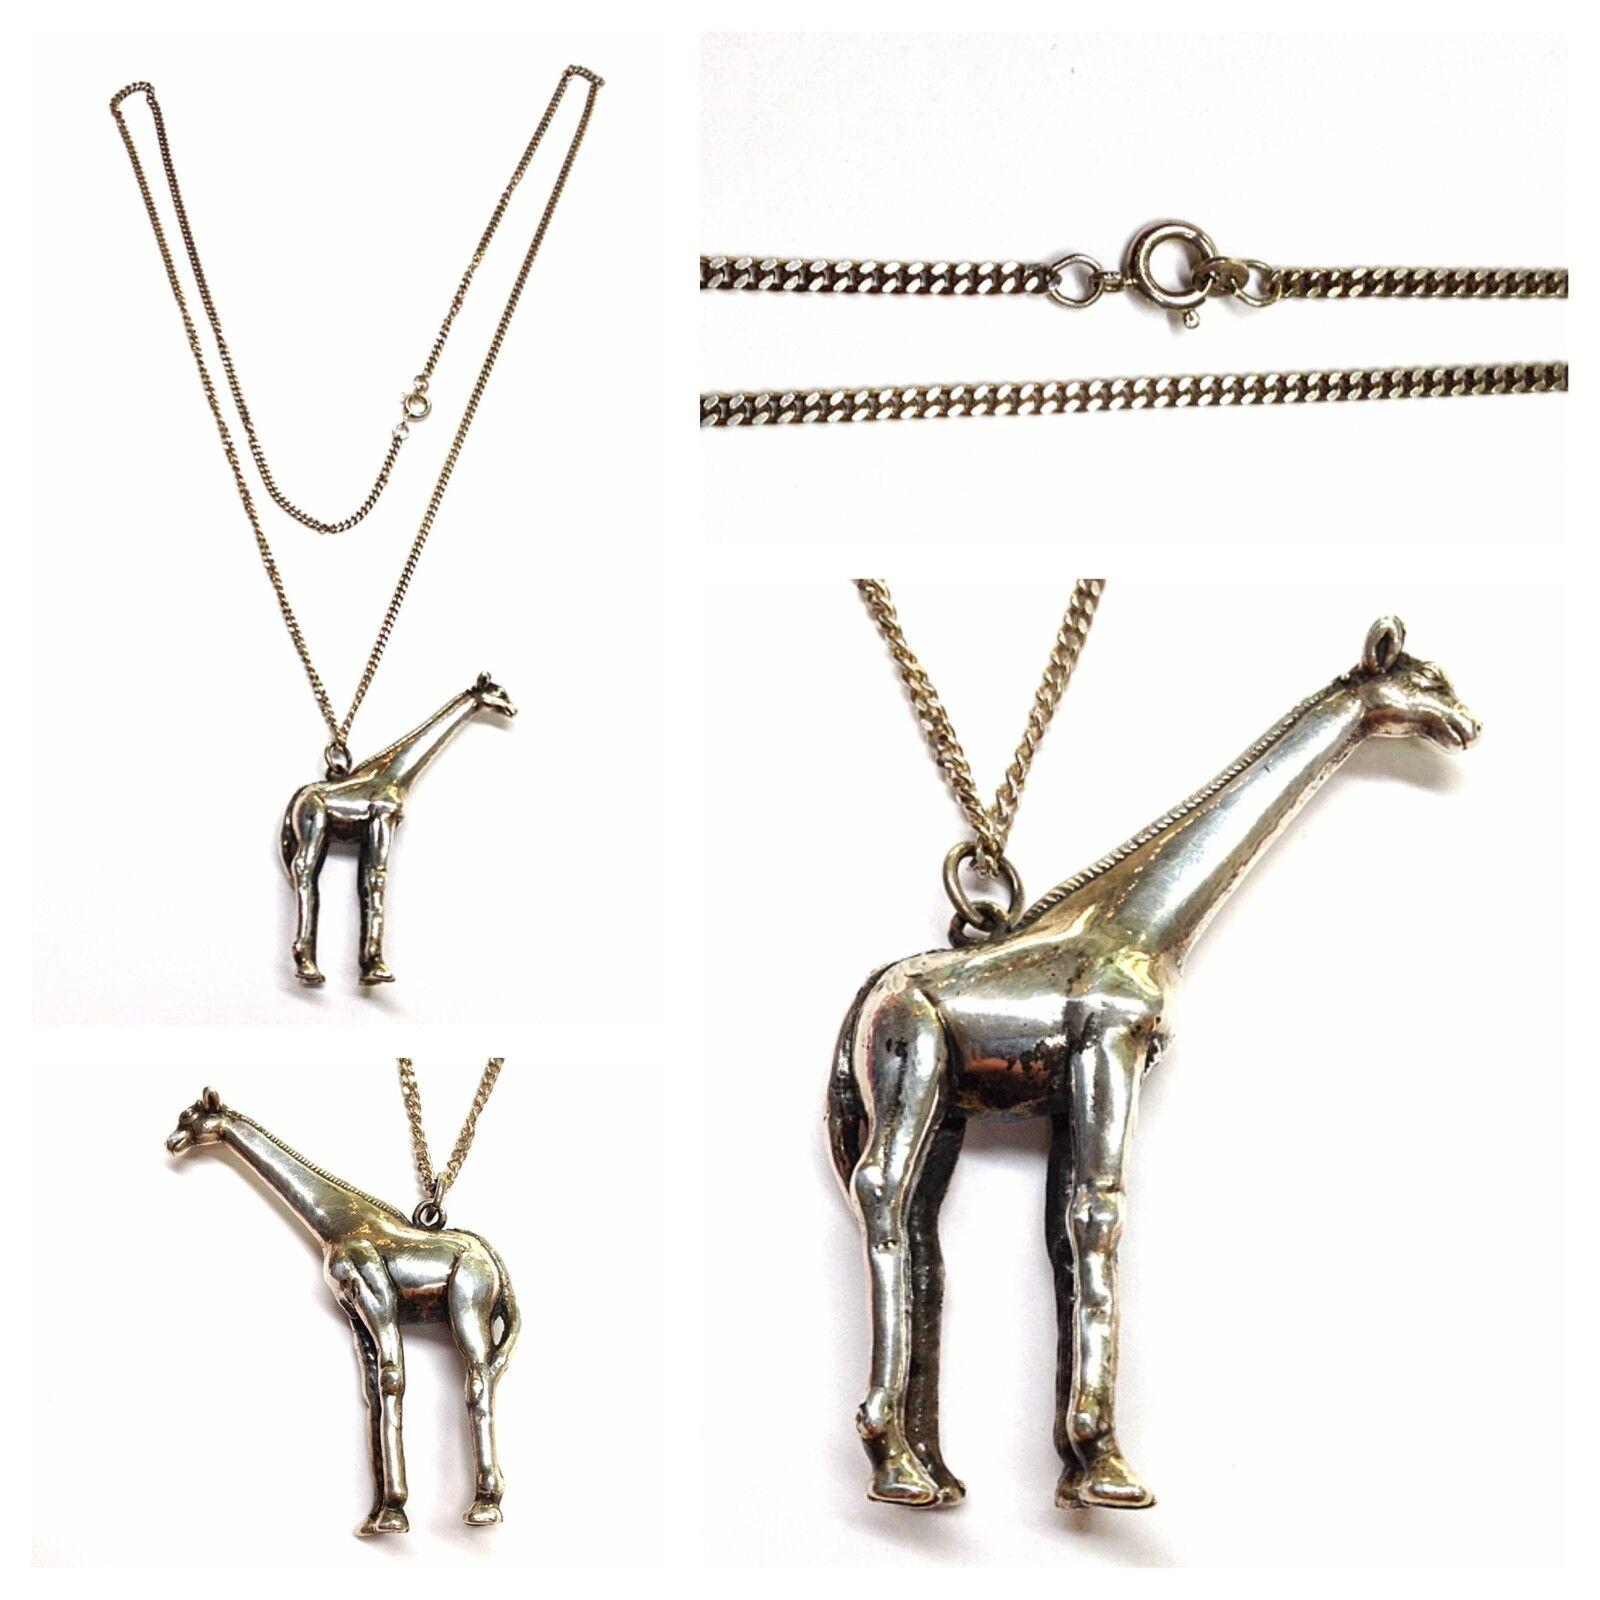 Lange silverkette 925er silver mit Anhänger Giraffe Kette Panzerkette 70 cm